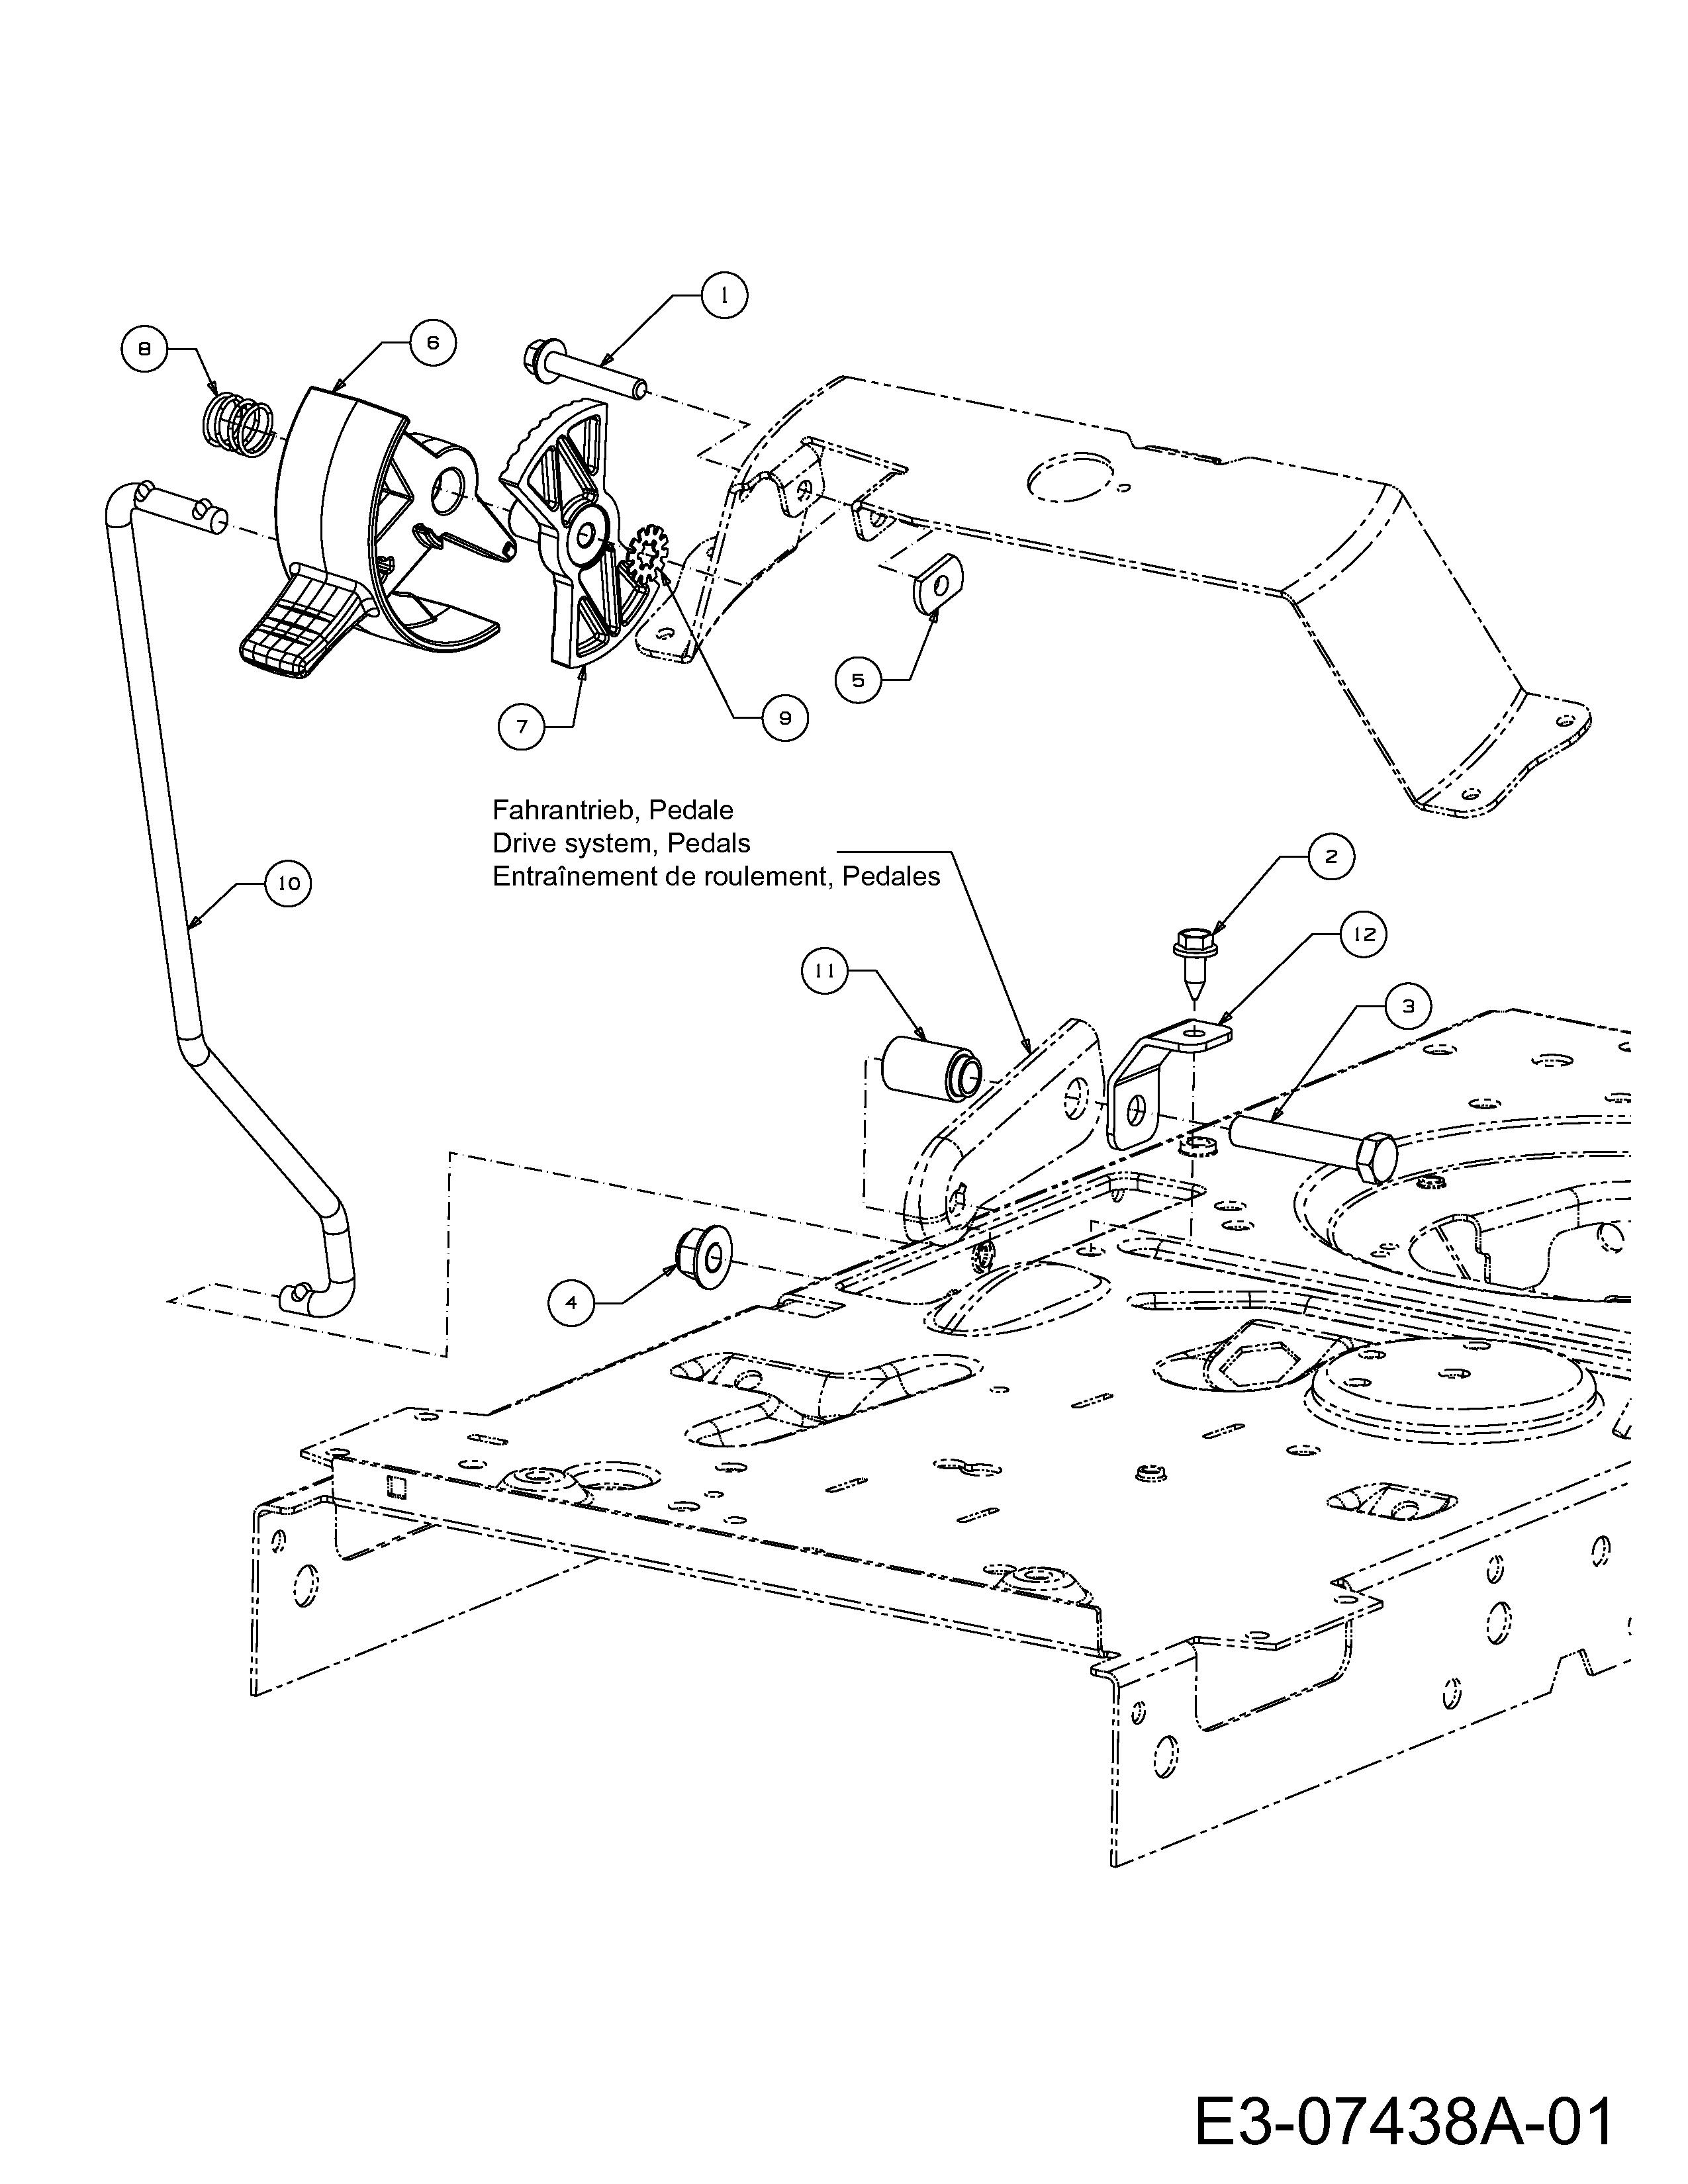 mastercut mastercut 92 155 geschwindigkeitsregelung. Black Bedroom Furniture Sets. Home Design Ideas